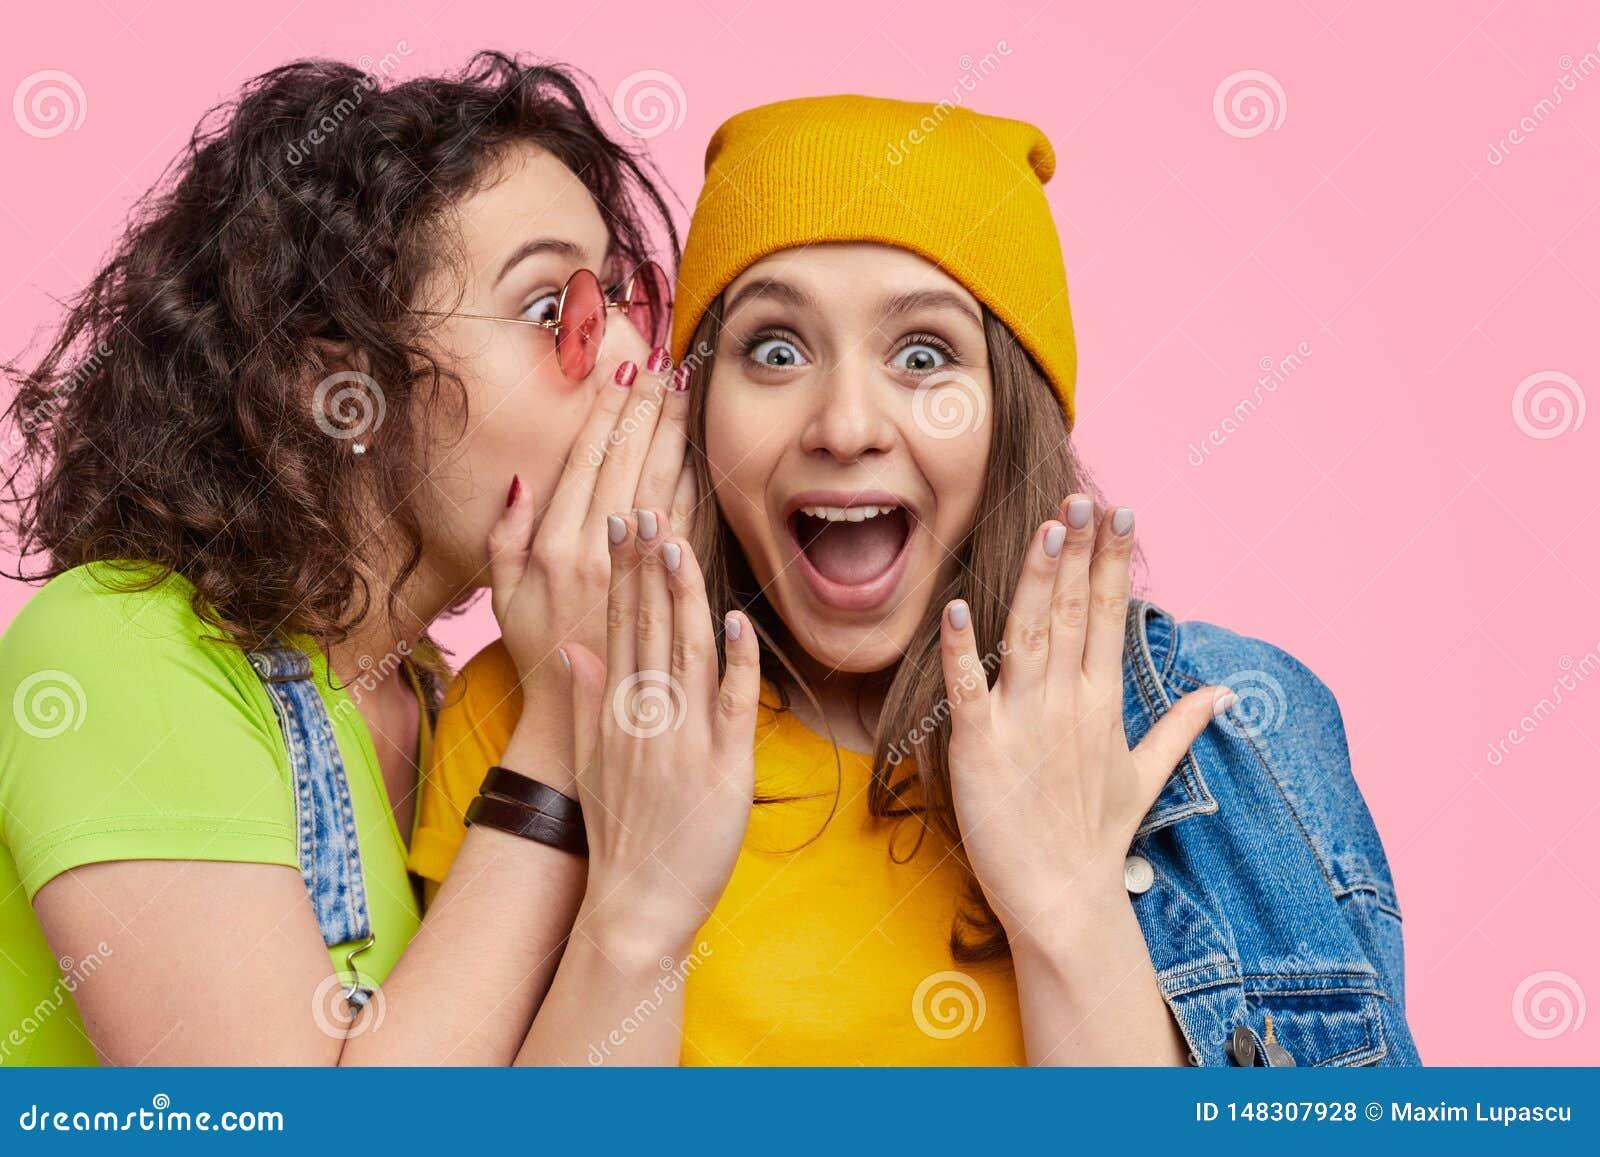 Female sharing secret with best friend